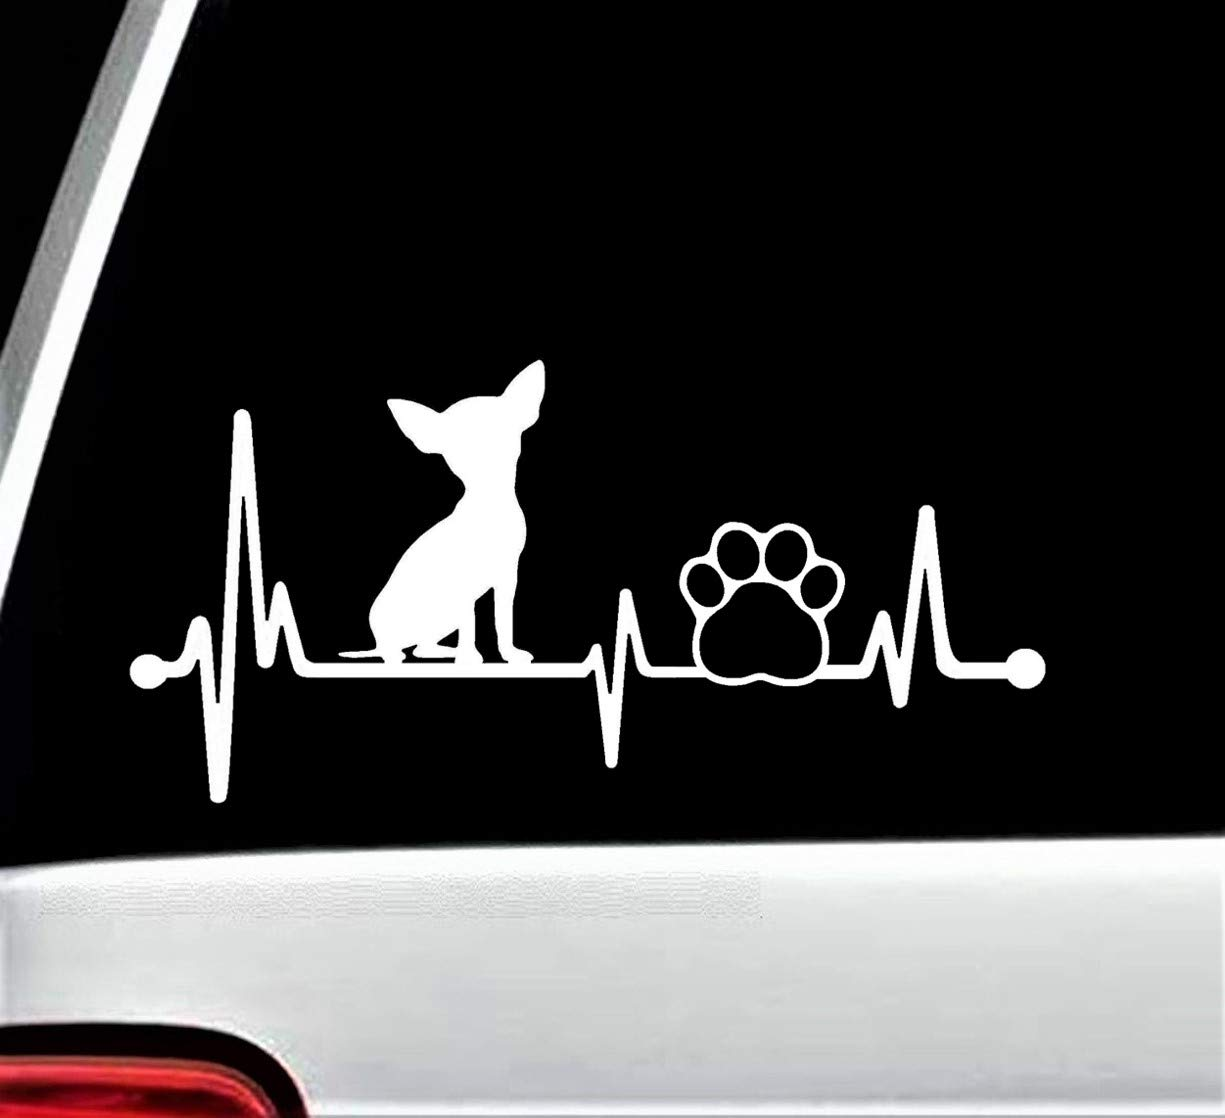 Chihuahua Heartbeat Paw Lifeline Decal Sticker for Car Window 8 Inch BG 134